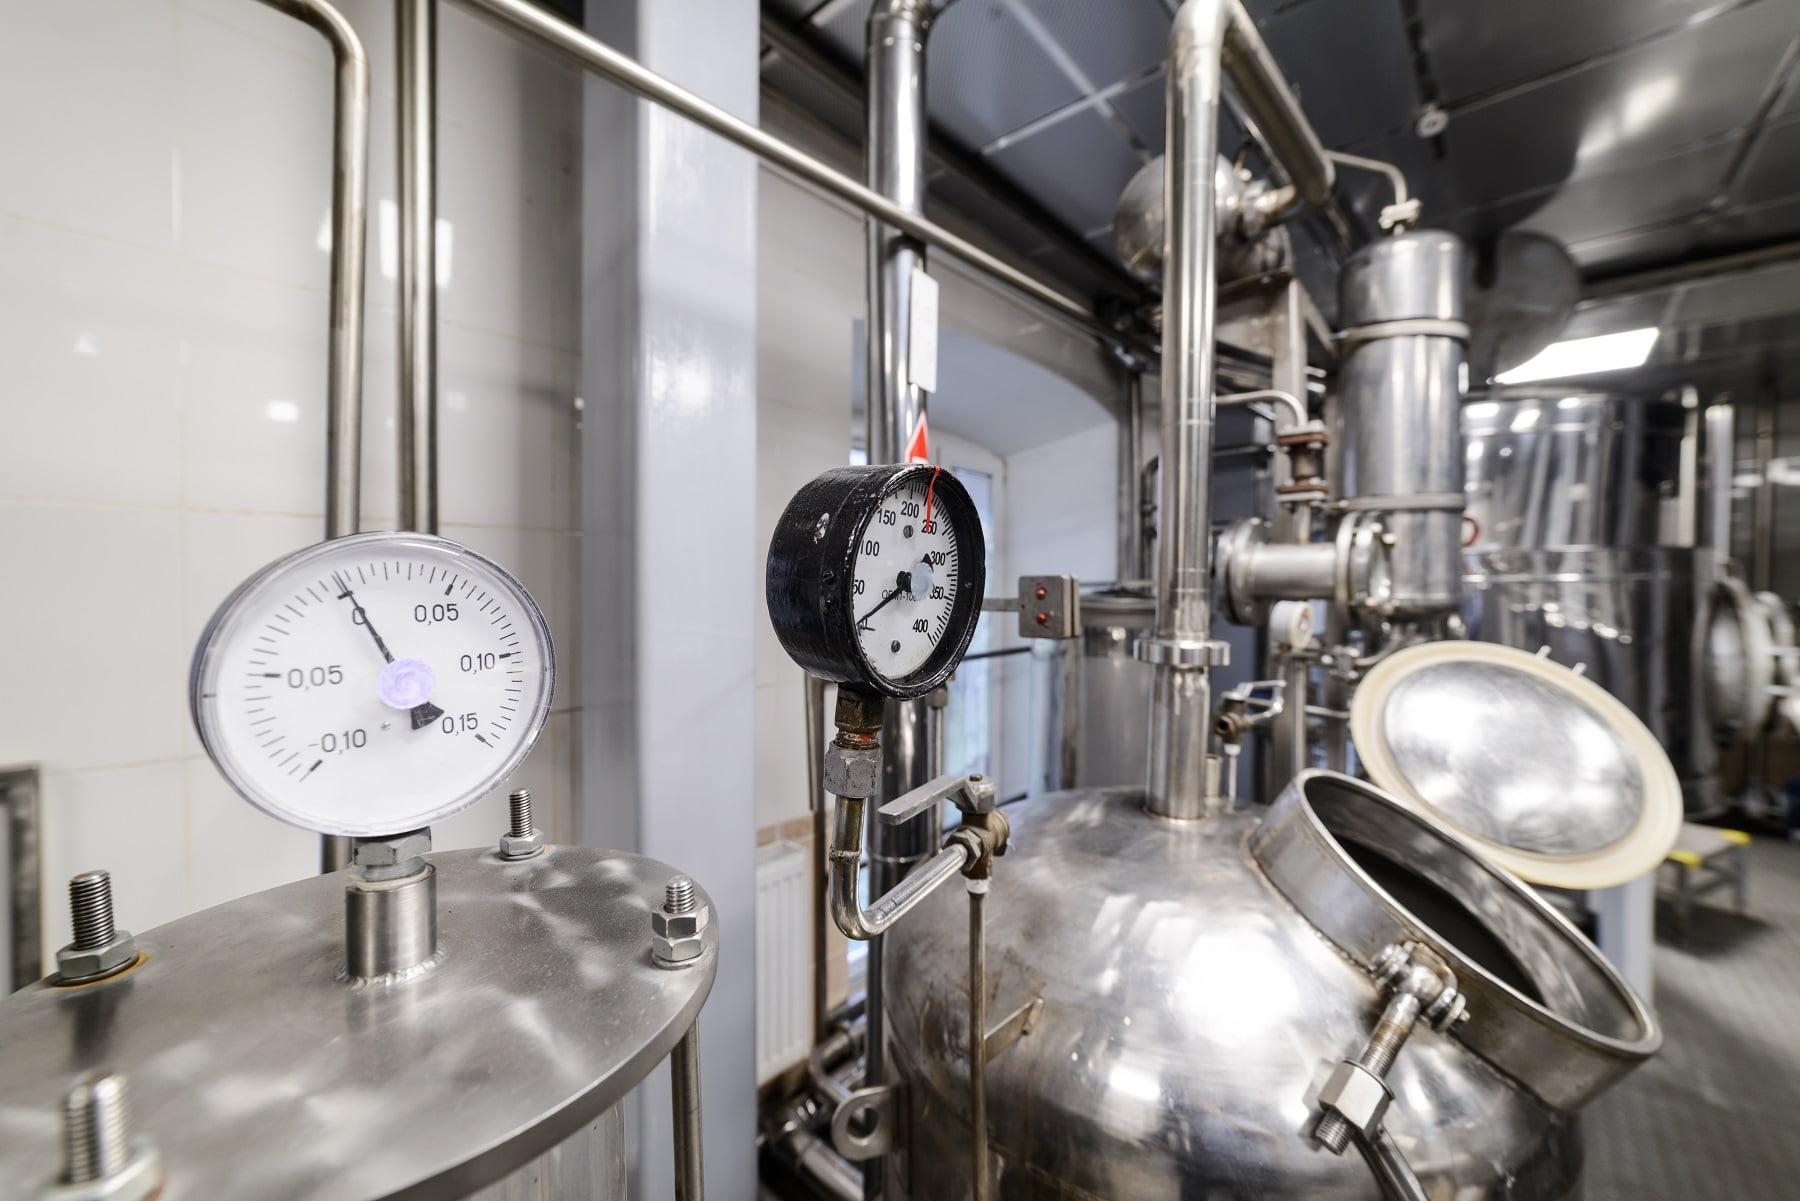 Pressure gauges. Alcohol distillation equipment